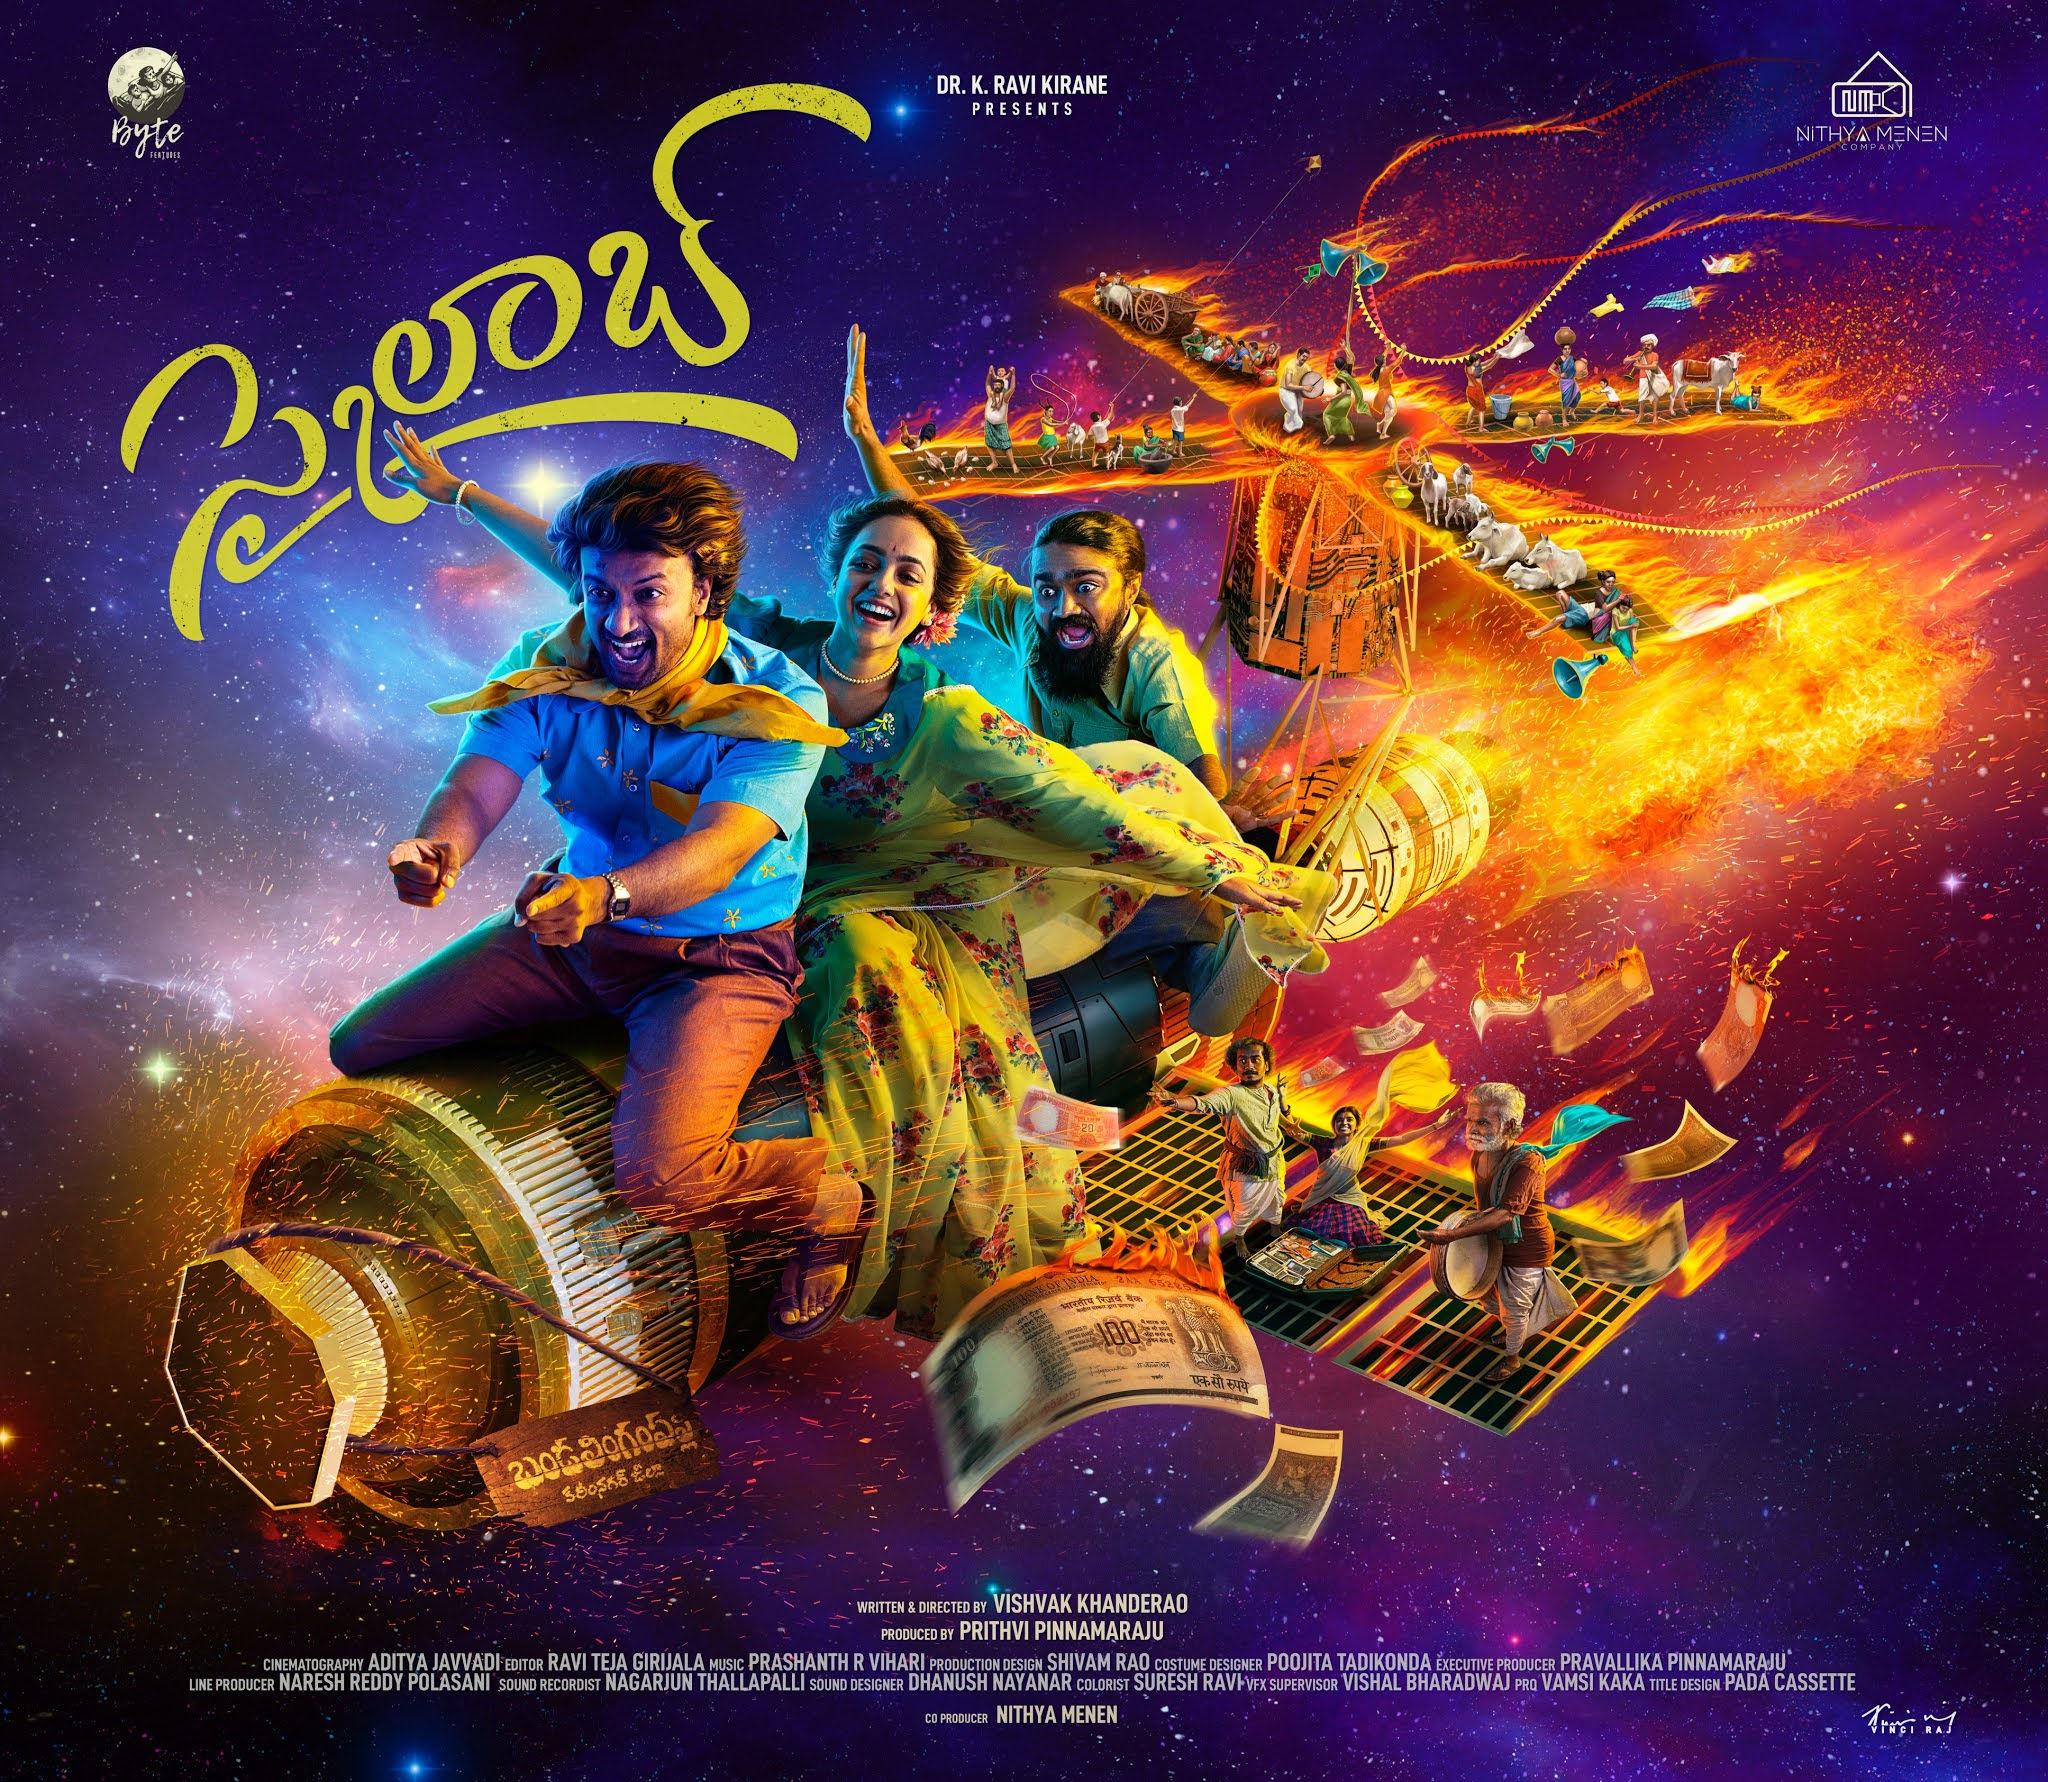 Satyadev Nithya Menen Rahul Ramakrishna Skylab Movie First Look Poster HD